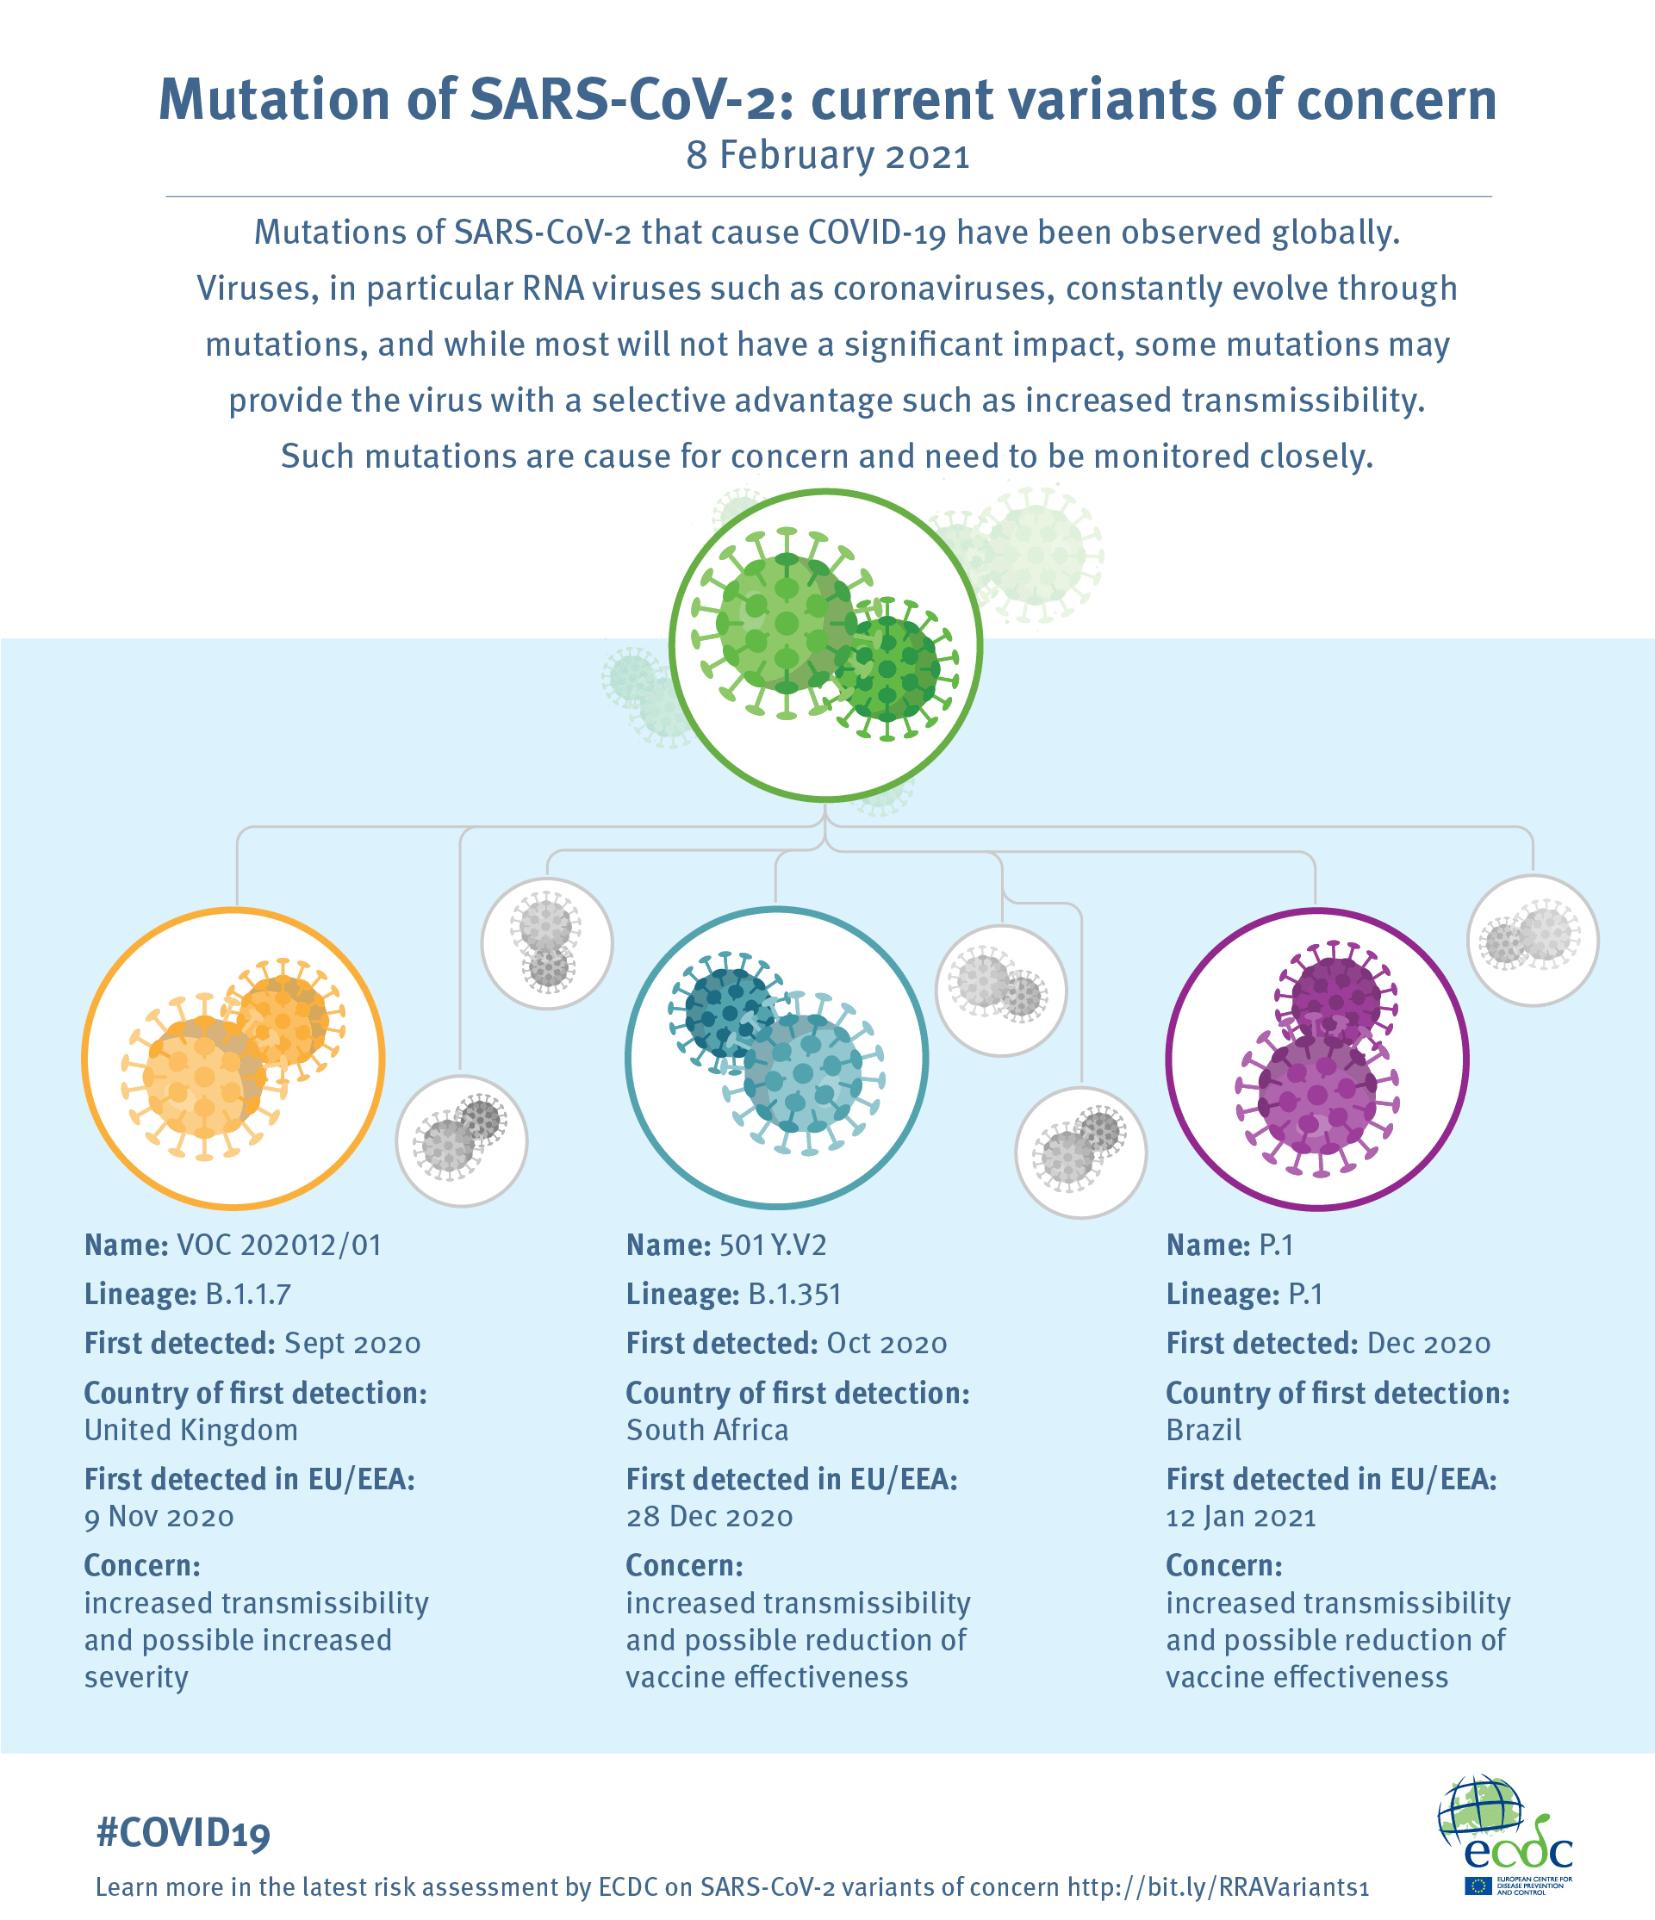 An infographic describing three SARS-CoV-2 variants of concern